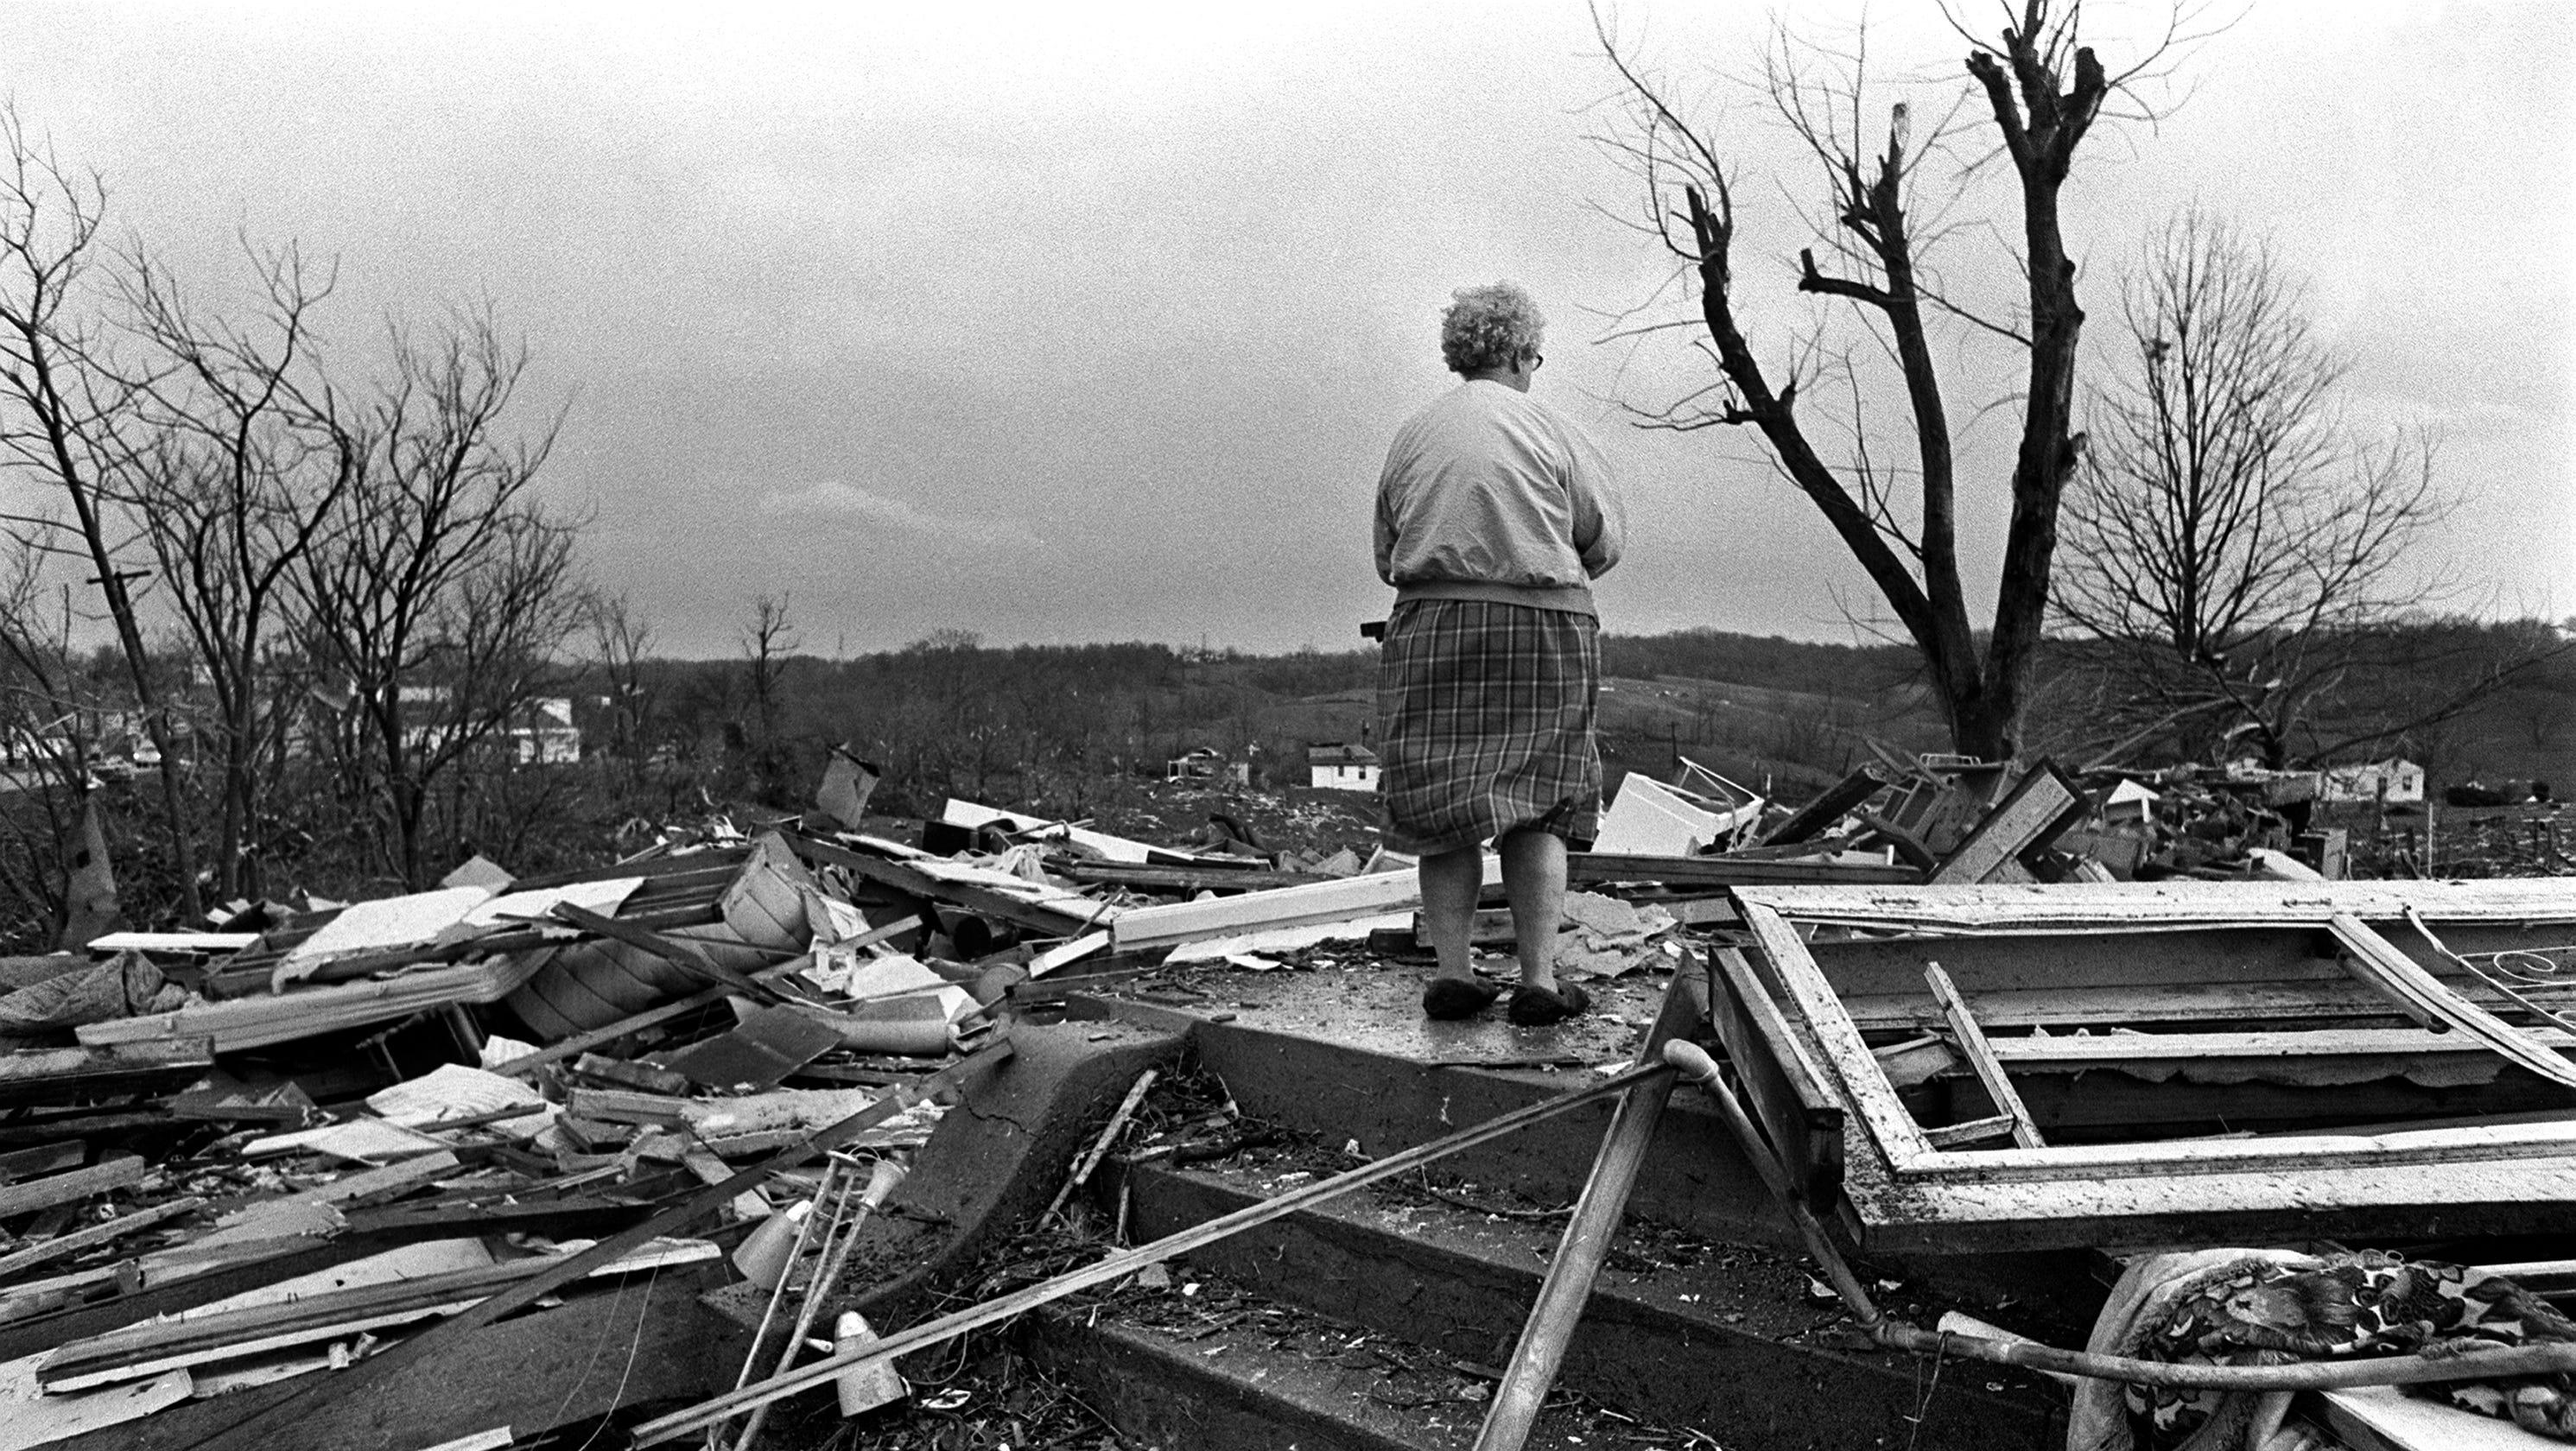 45 years ago deadliest tornadoes devastated region